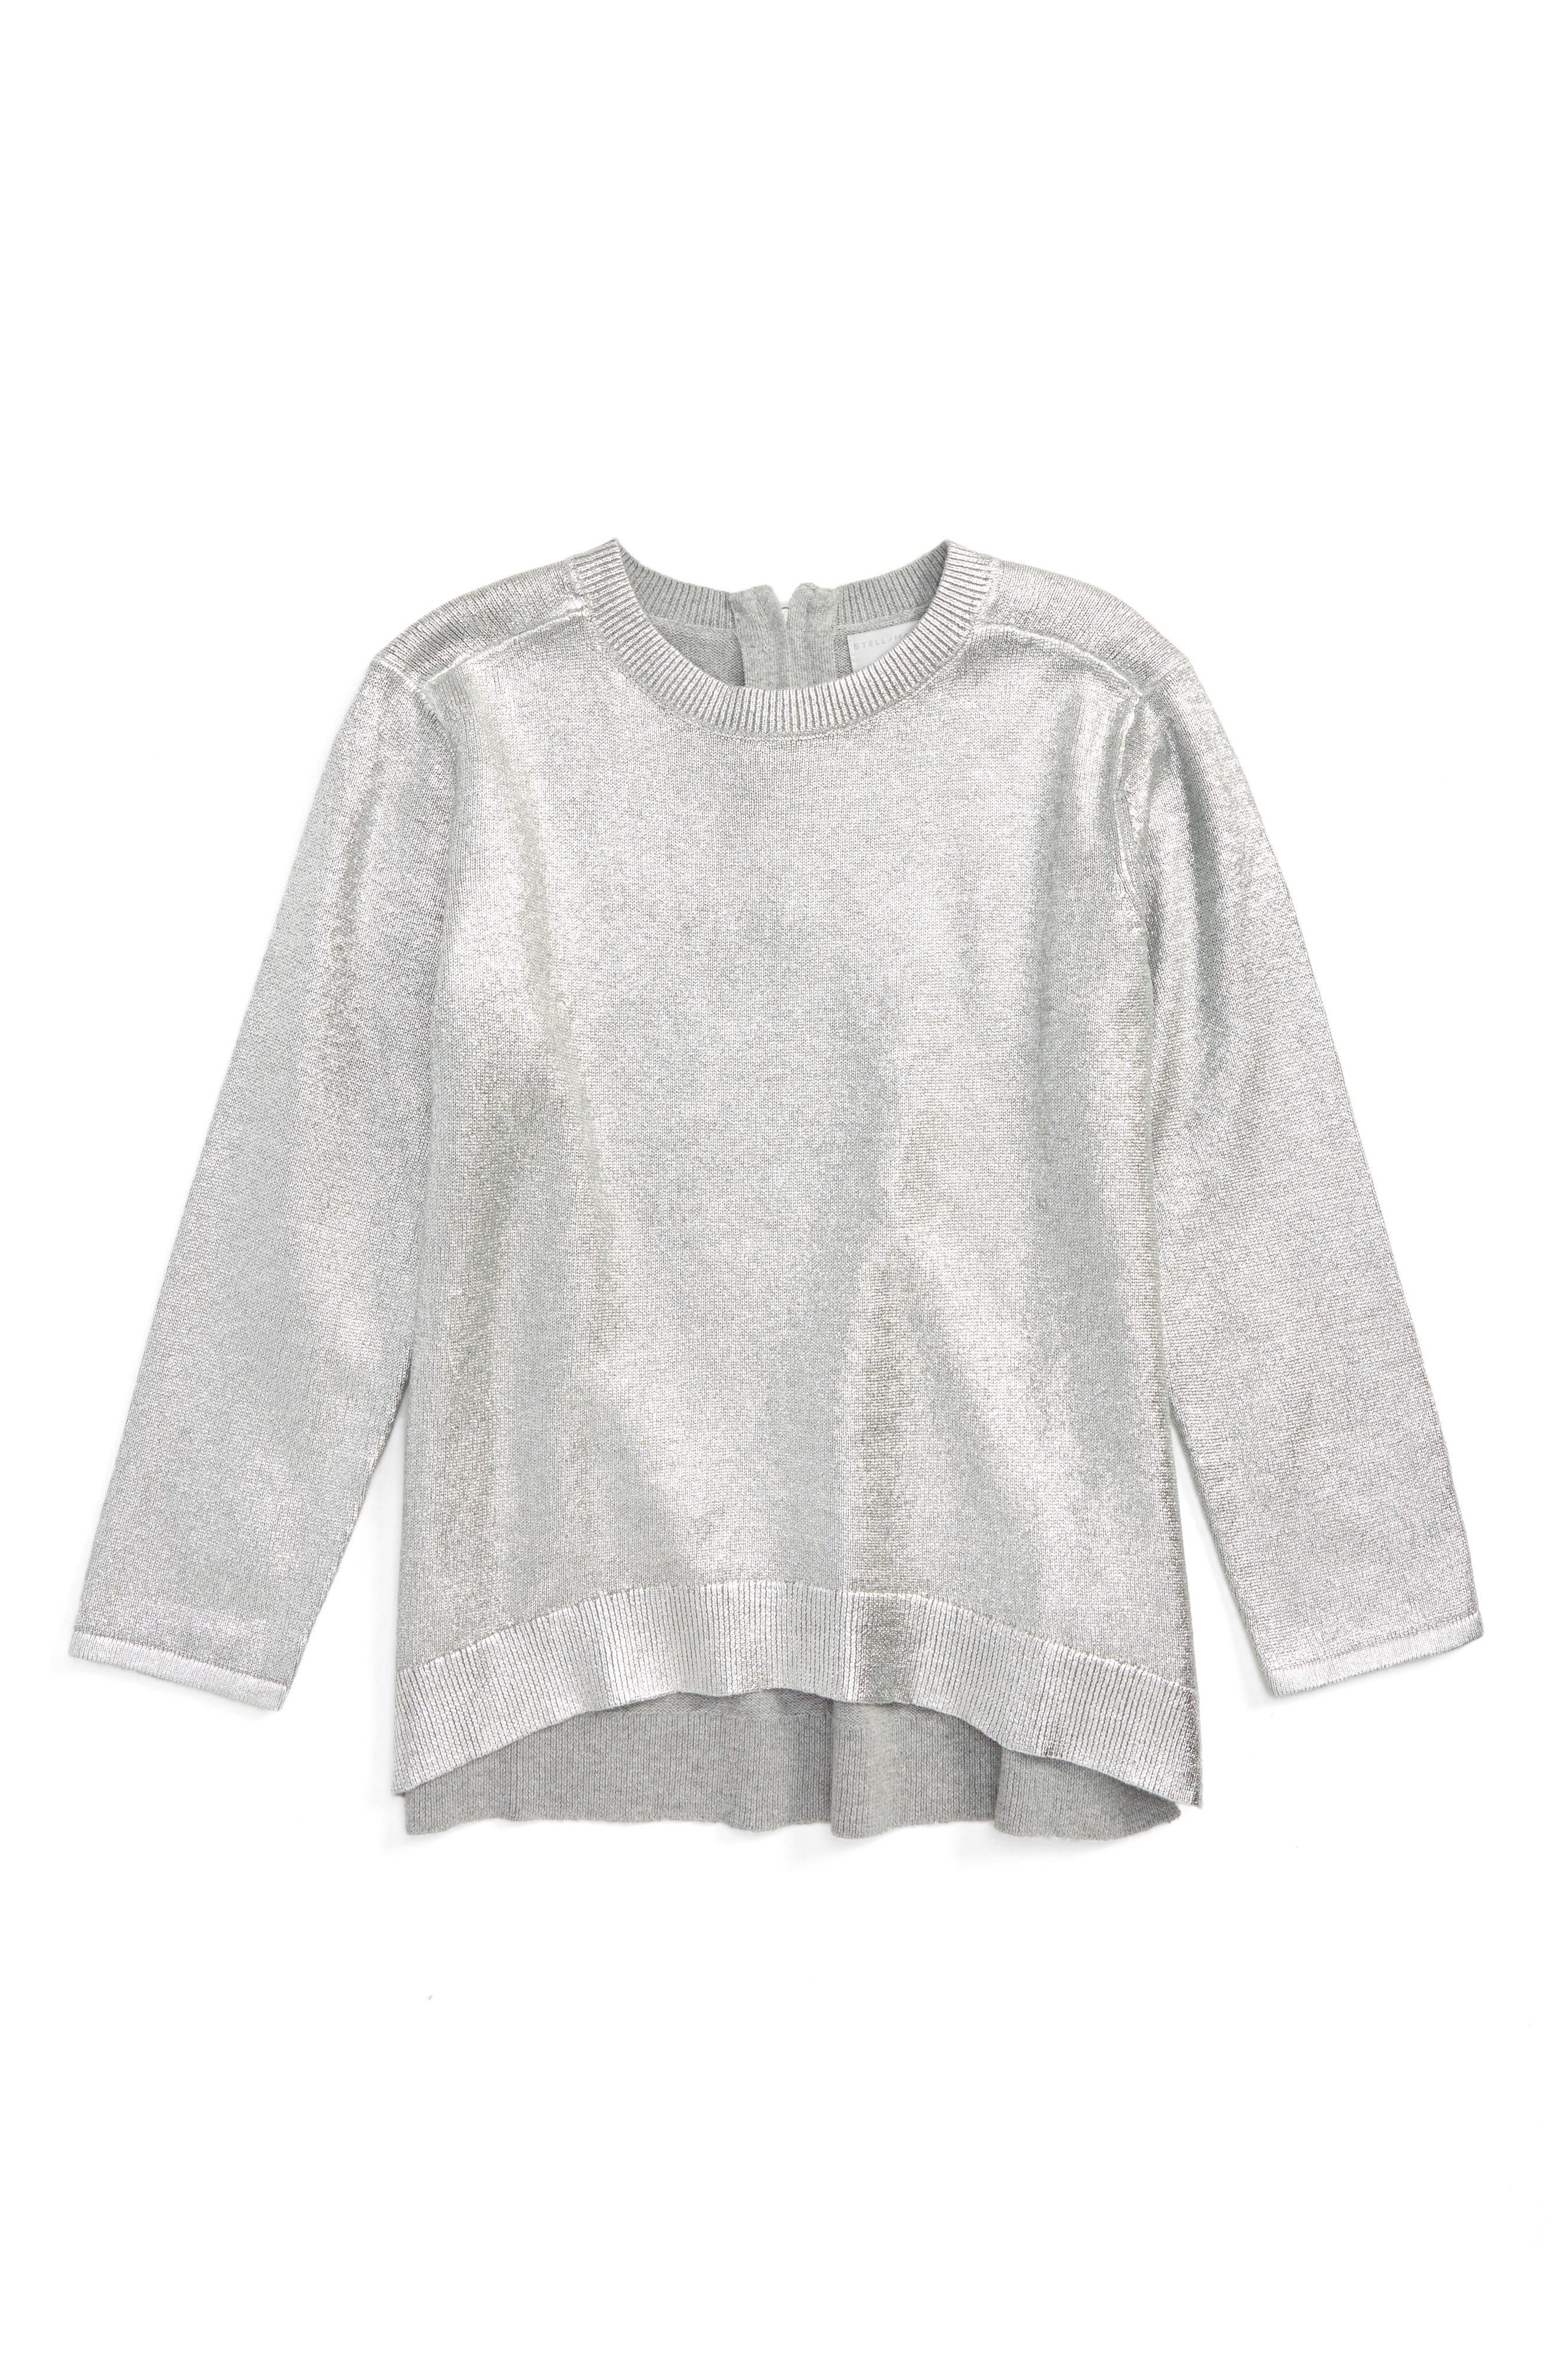 Kids Jewel Foil Sweater,                             Main thumbnail 1, color,